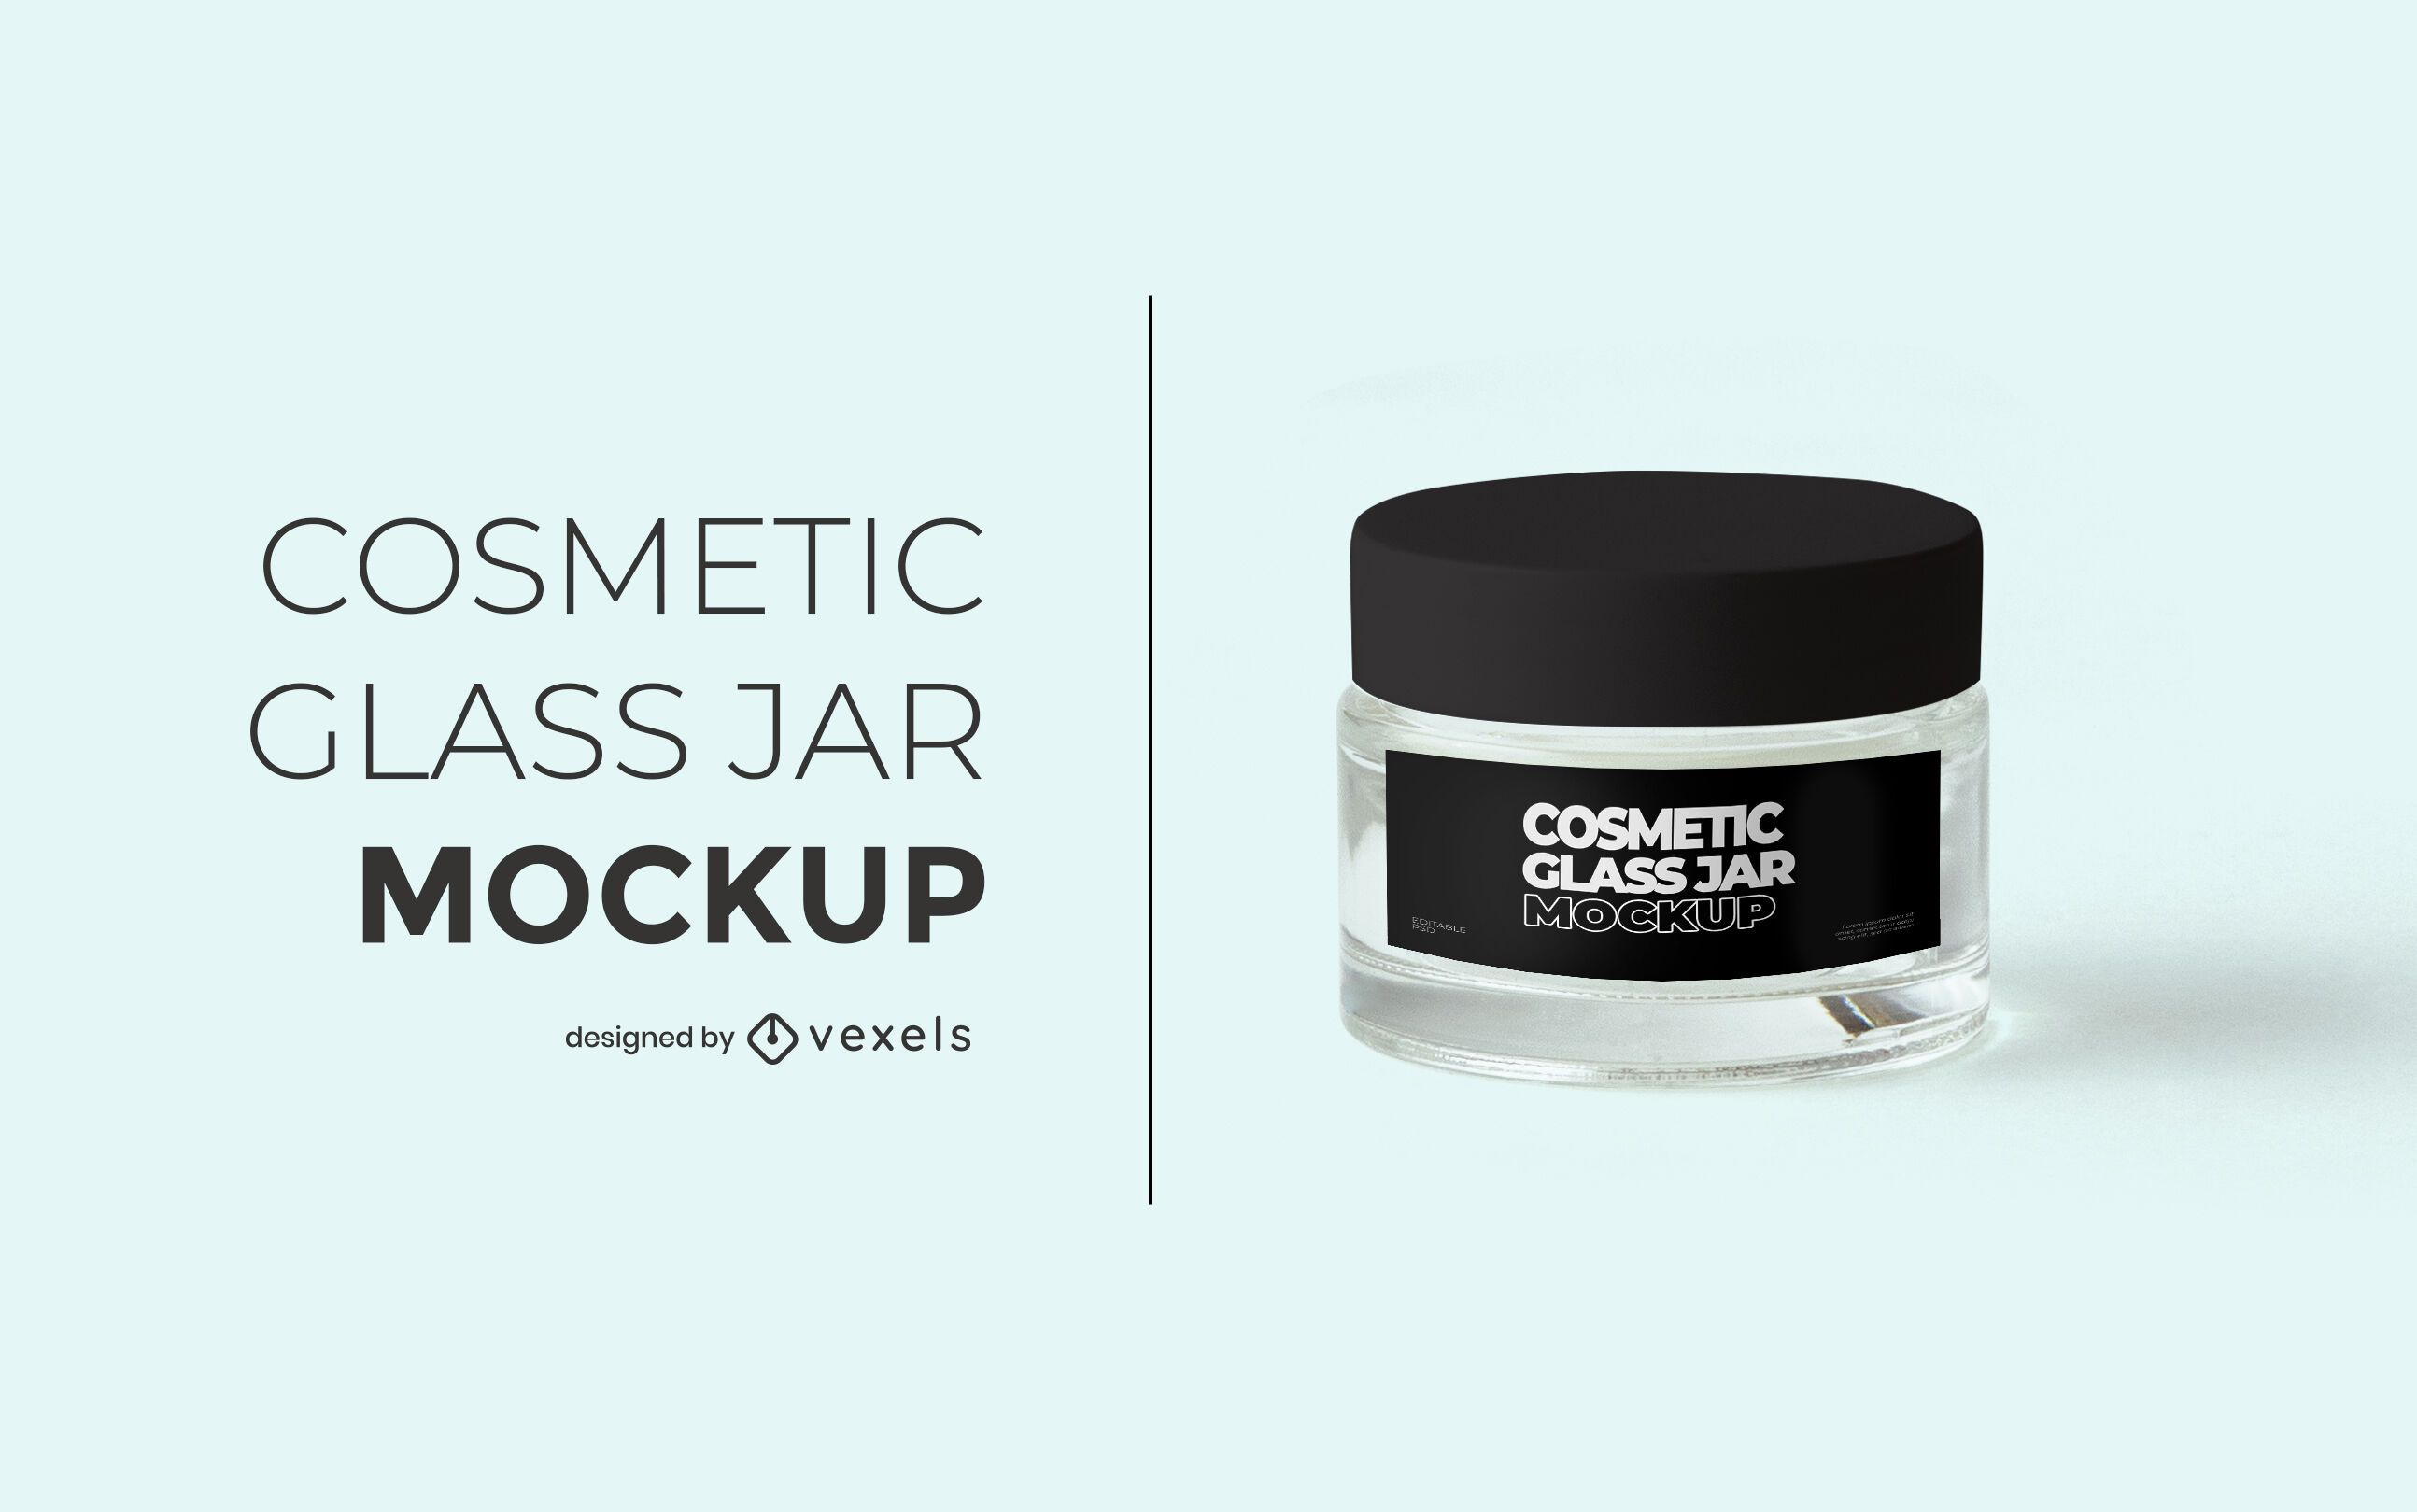 Cosmetic glass jar mockup design